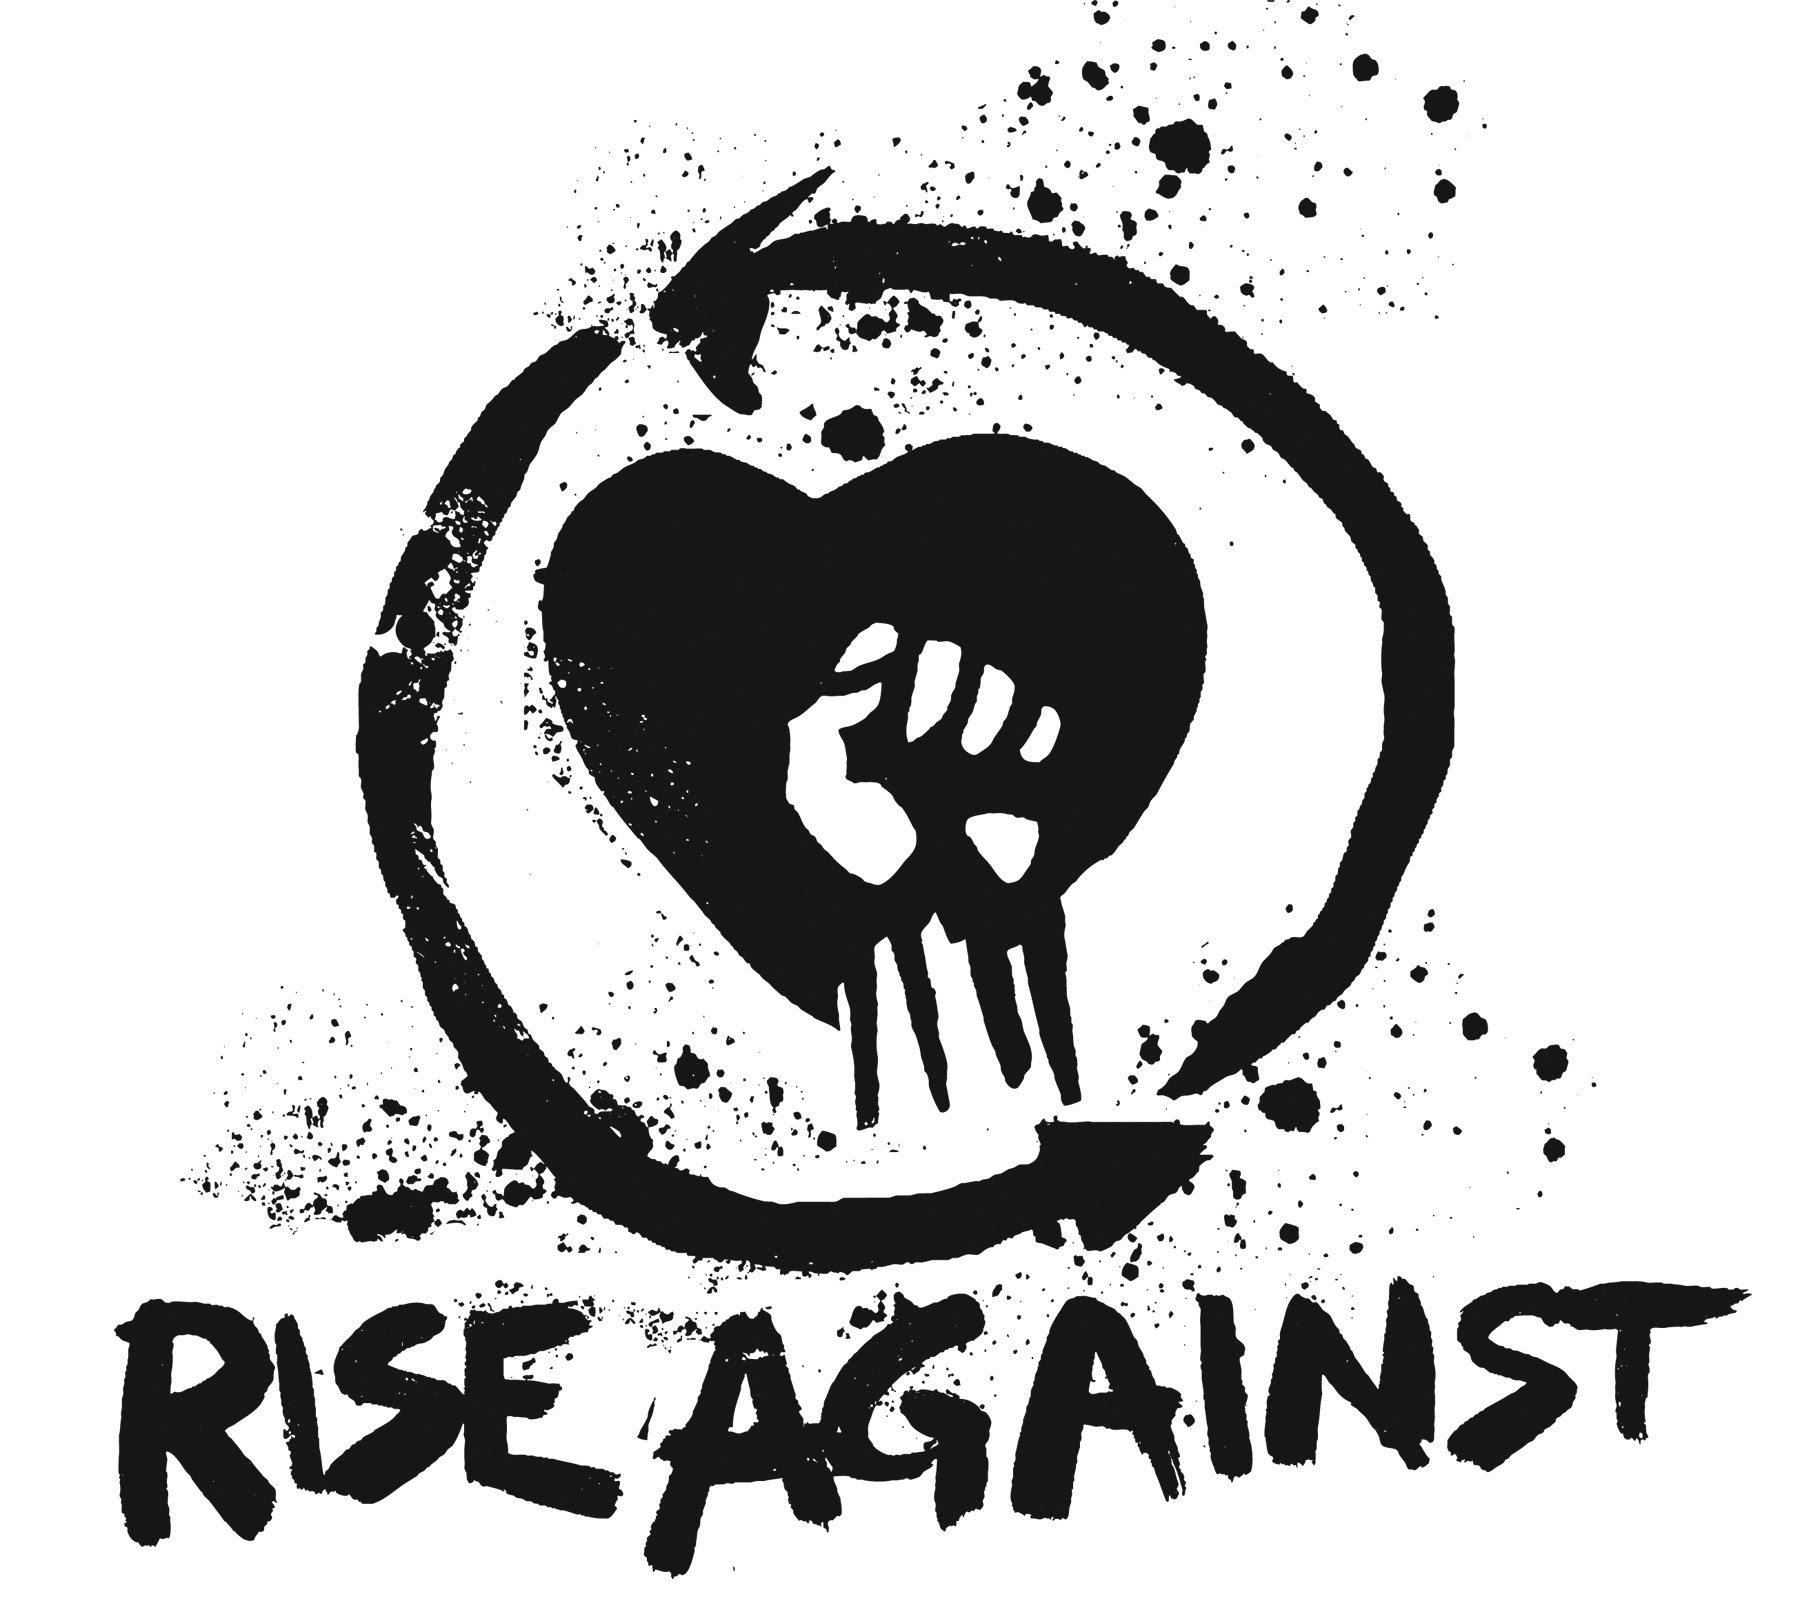 Rise Against Heart Fist Tattoo Inkcarceration Festival Announces